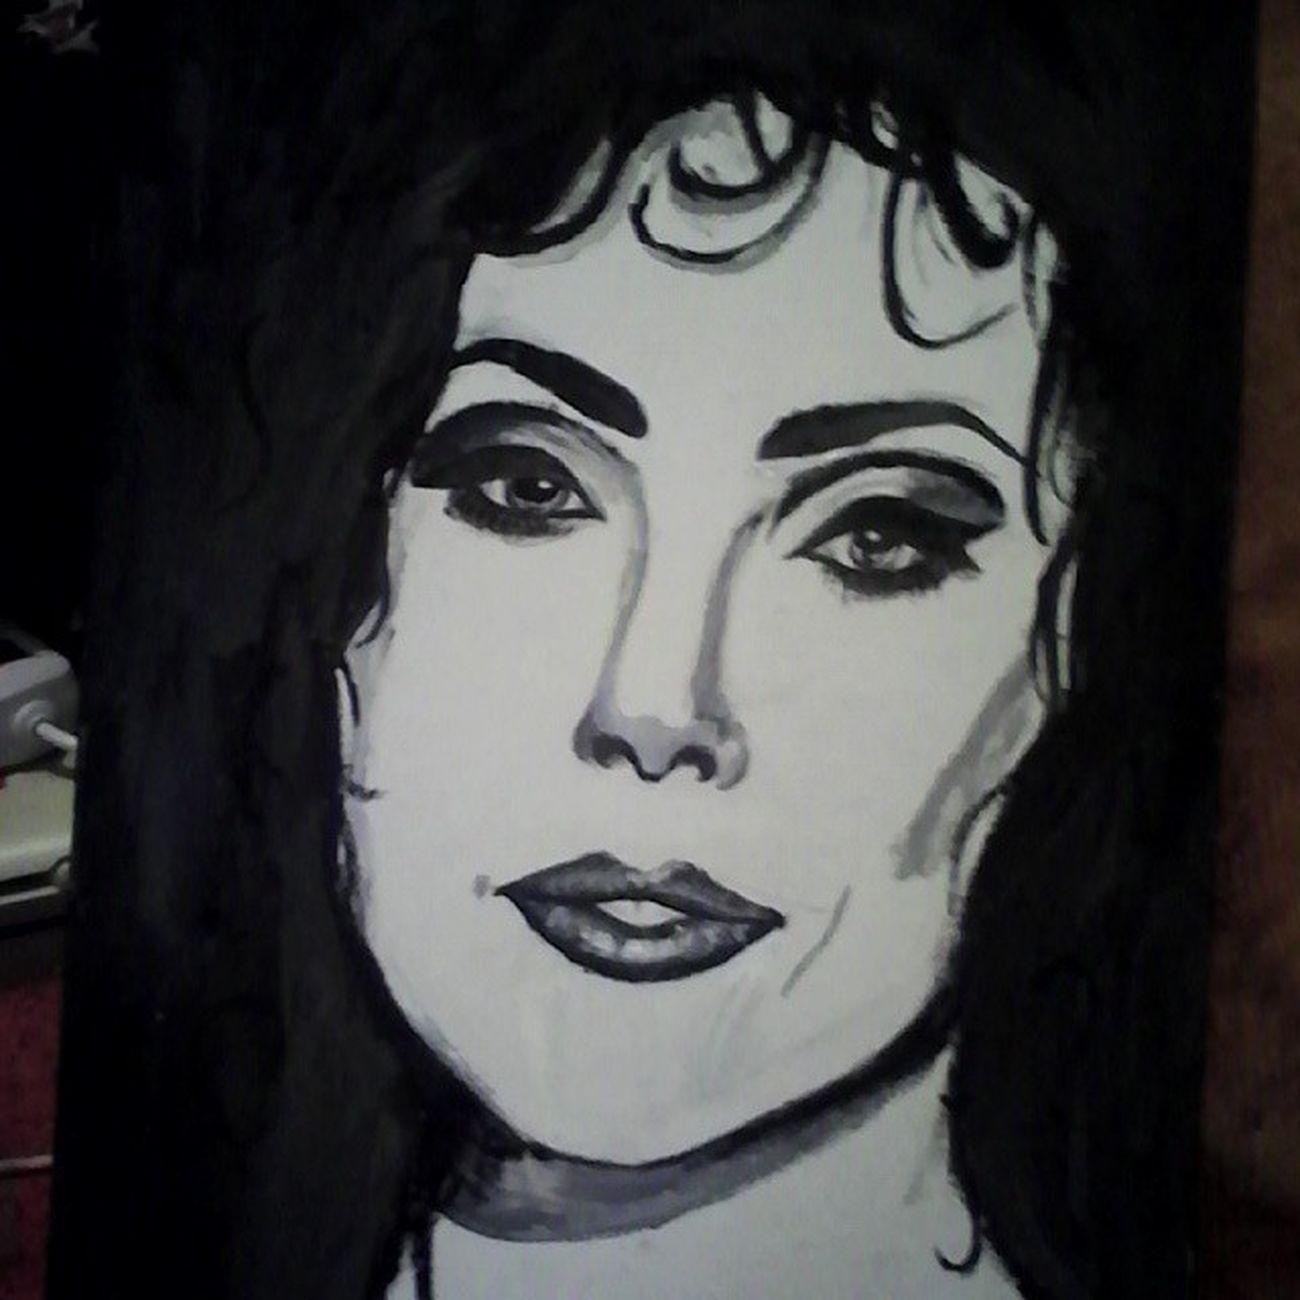 CheekToCheek . Drawing by me.. @ladygaga Cheektocheek Gaga Littlemonsters Monster4life MonstersFamily Pawsup